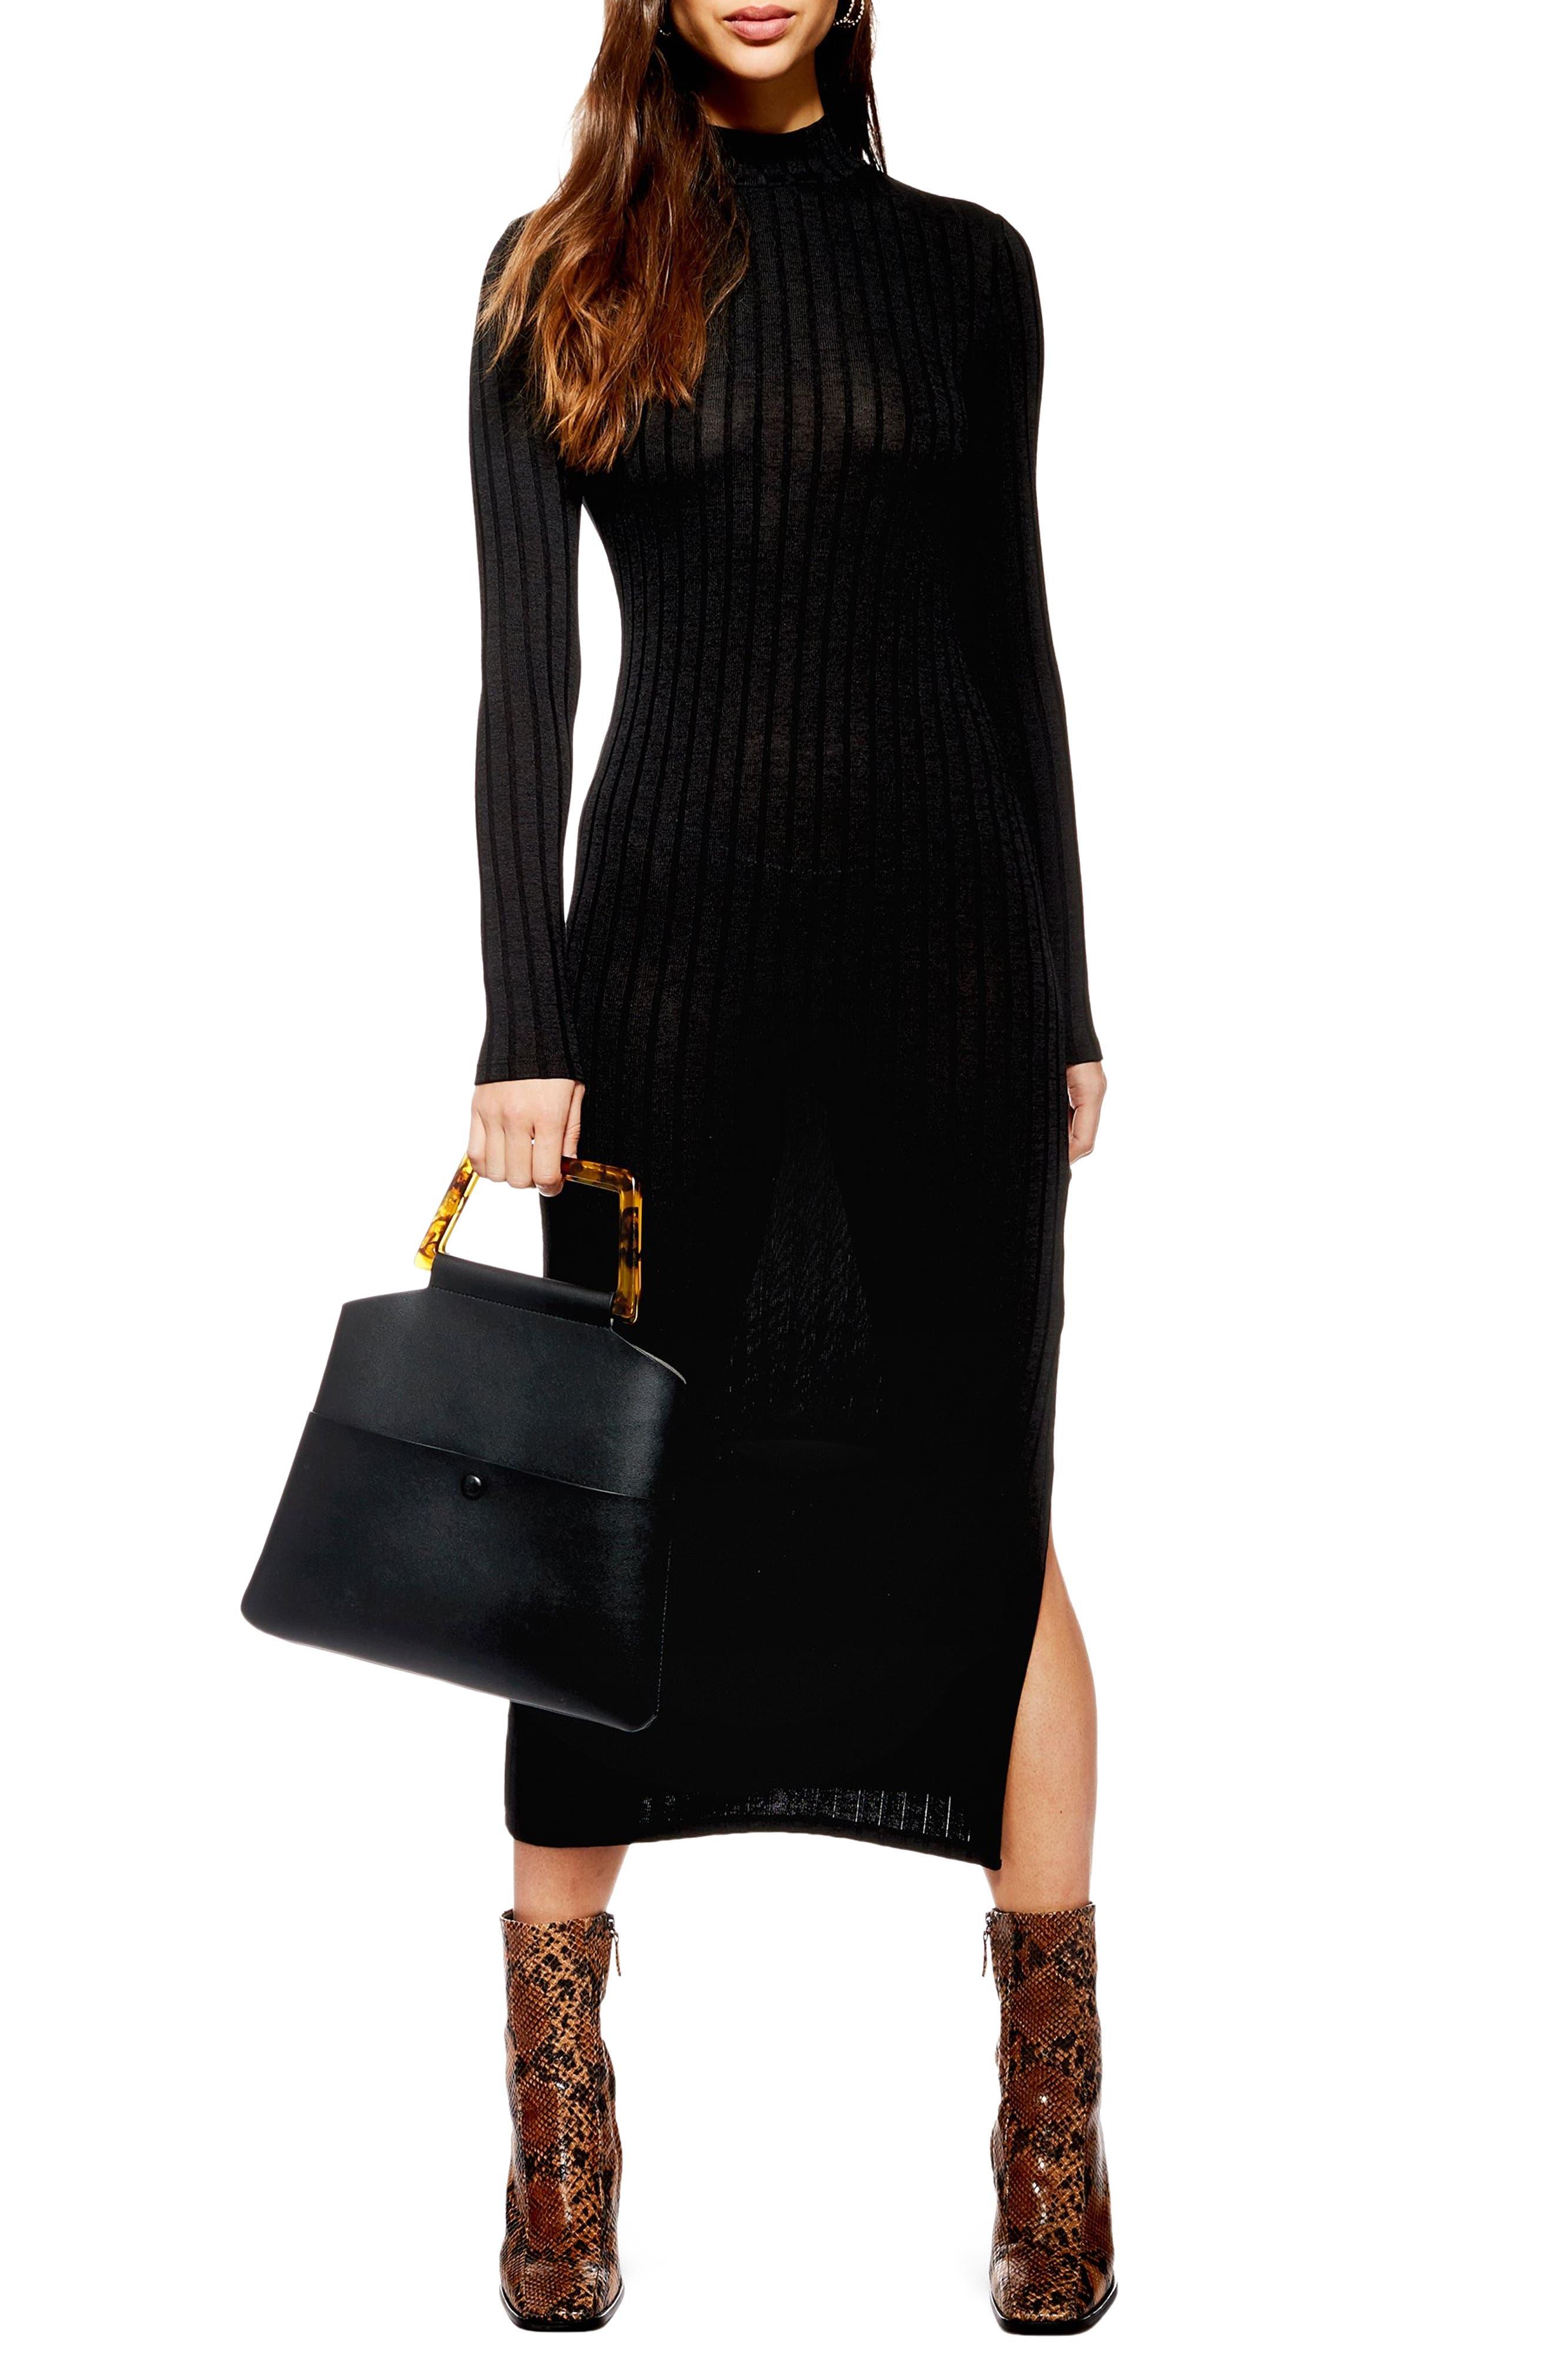 Topshop High Neck Ribbed Midi Dress, US (fits like 0) - Black